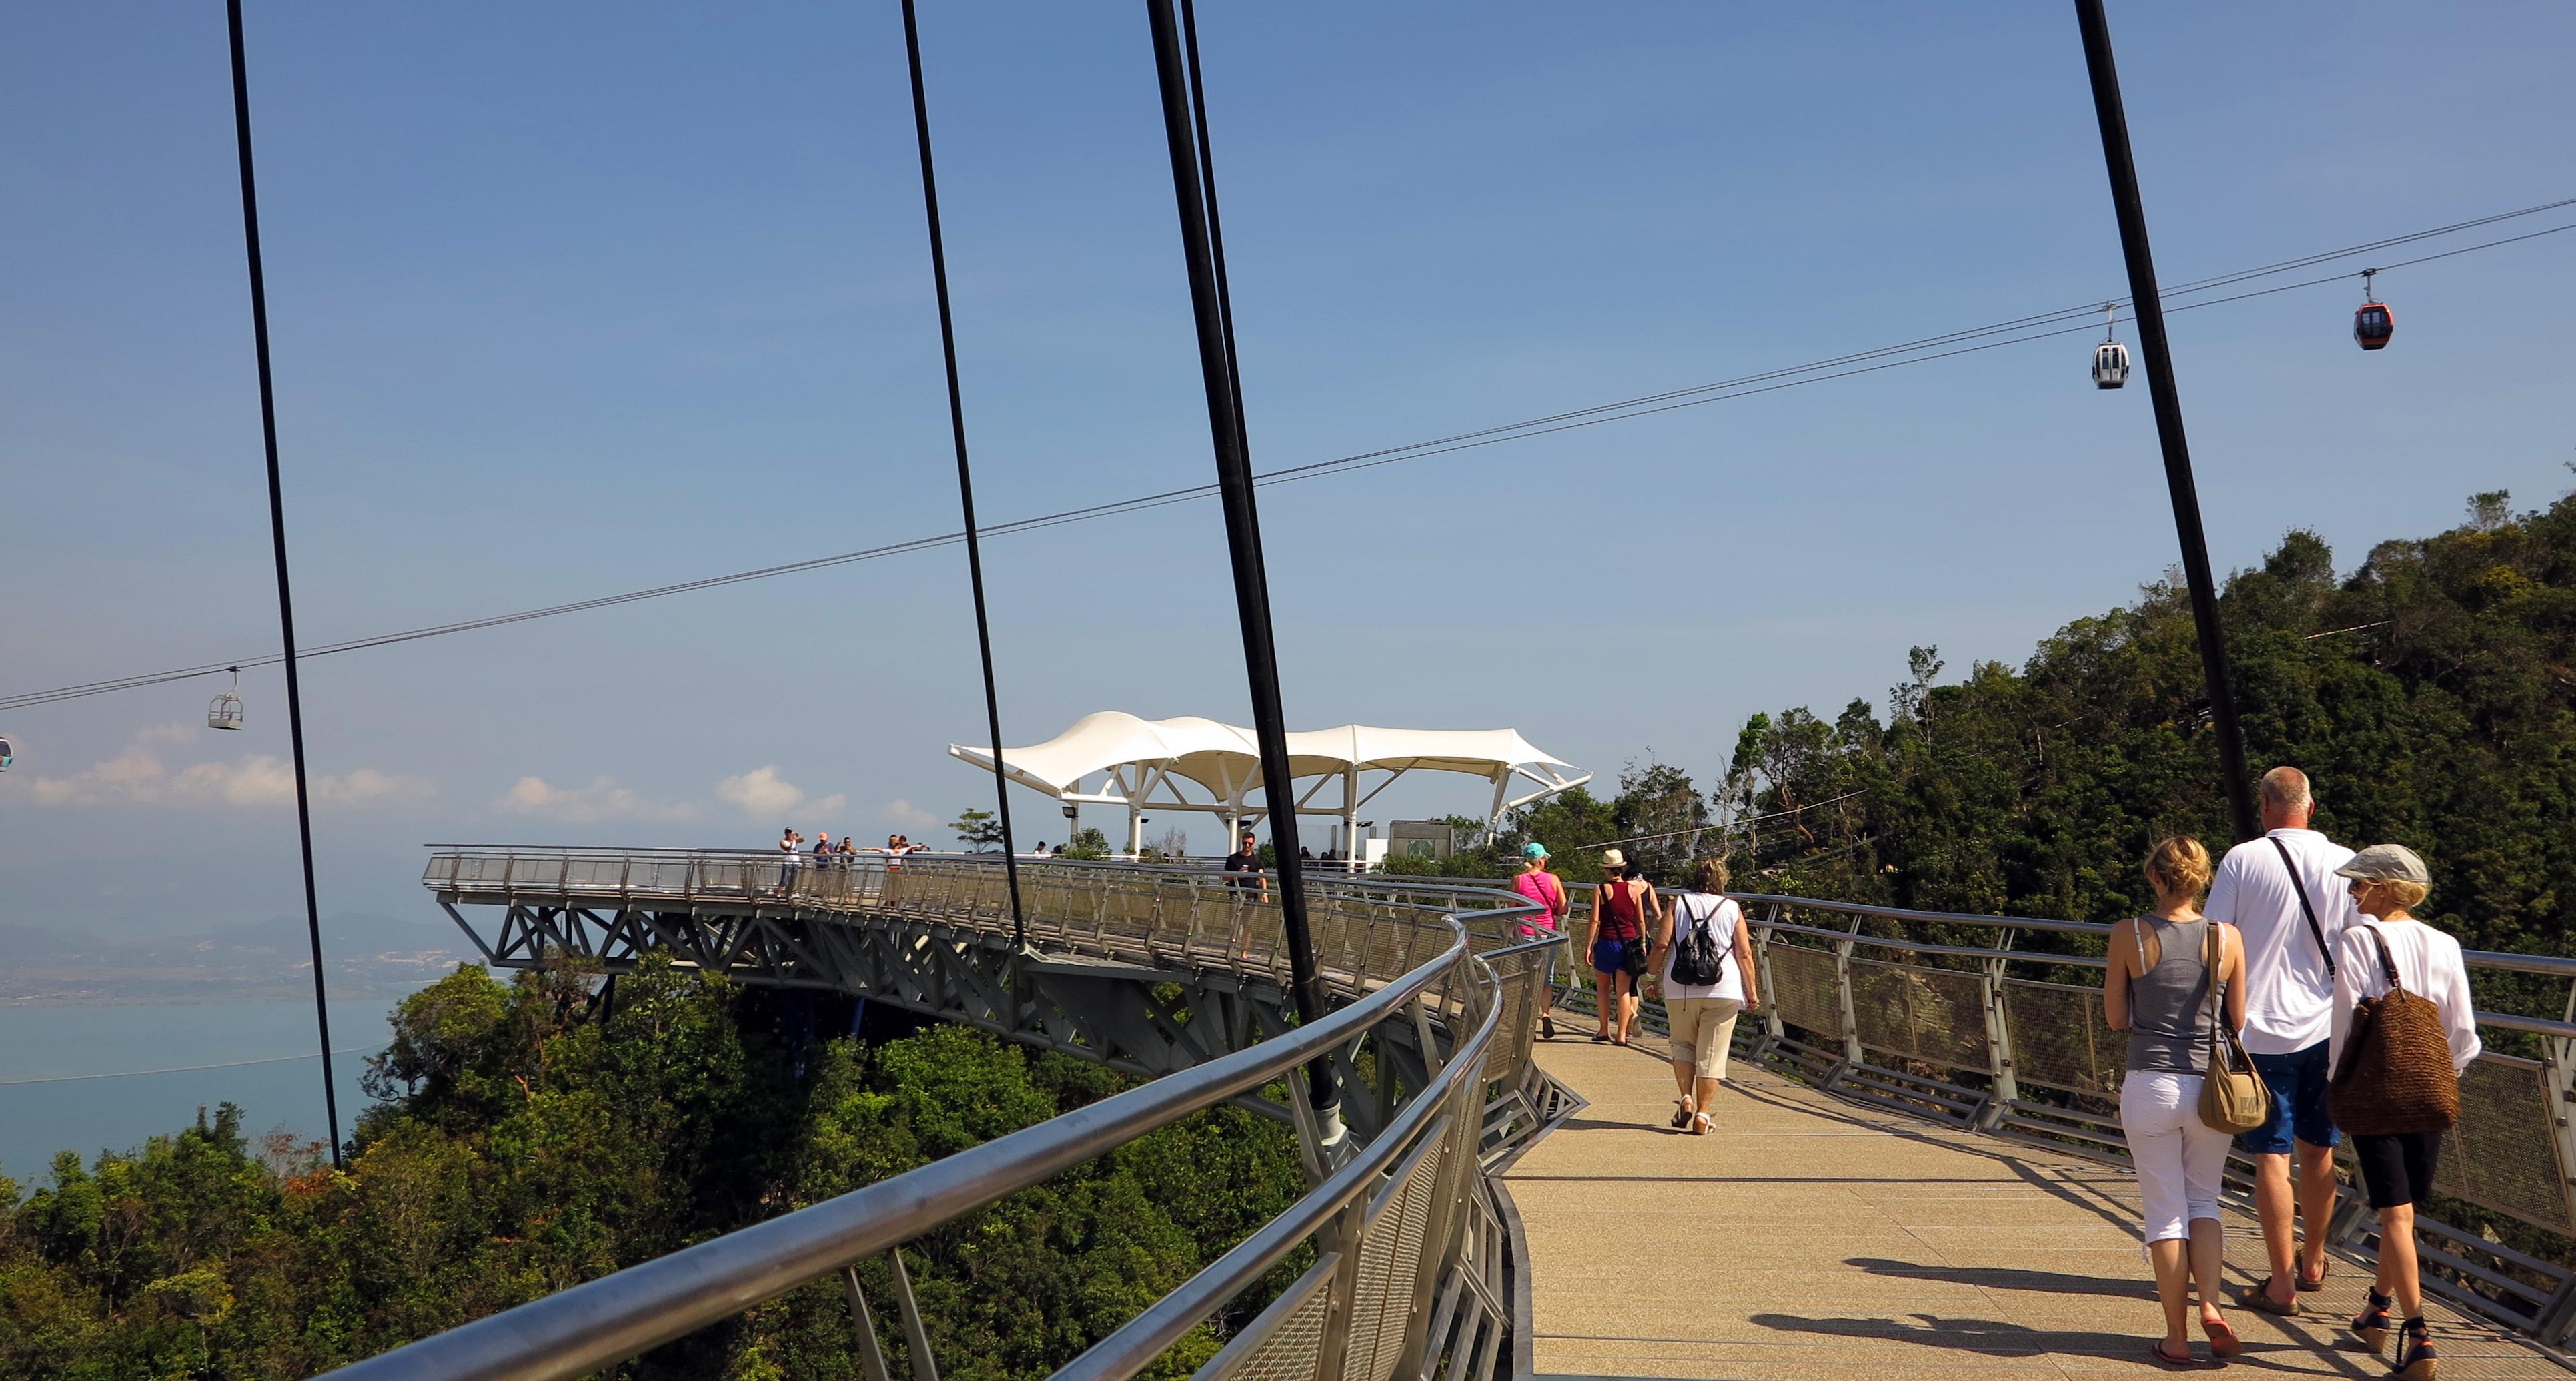 Malajsie-ostrov-Langkawi-most-Sky-Bridge